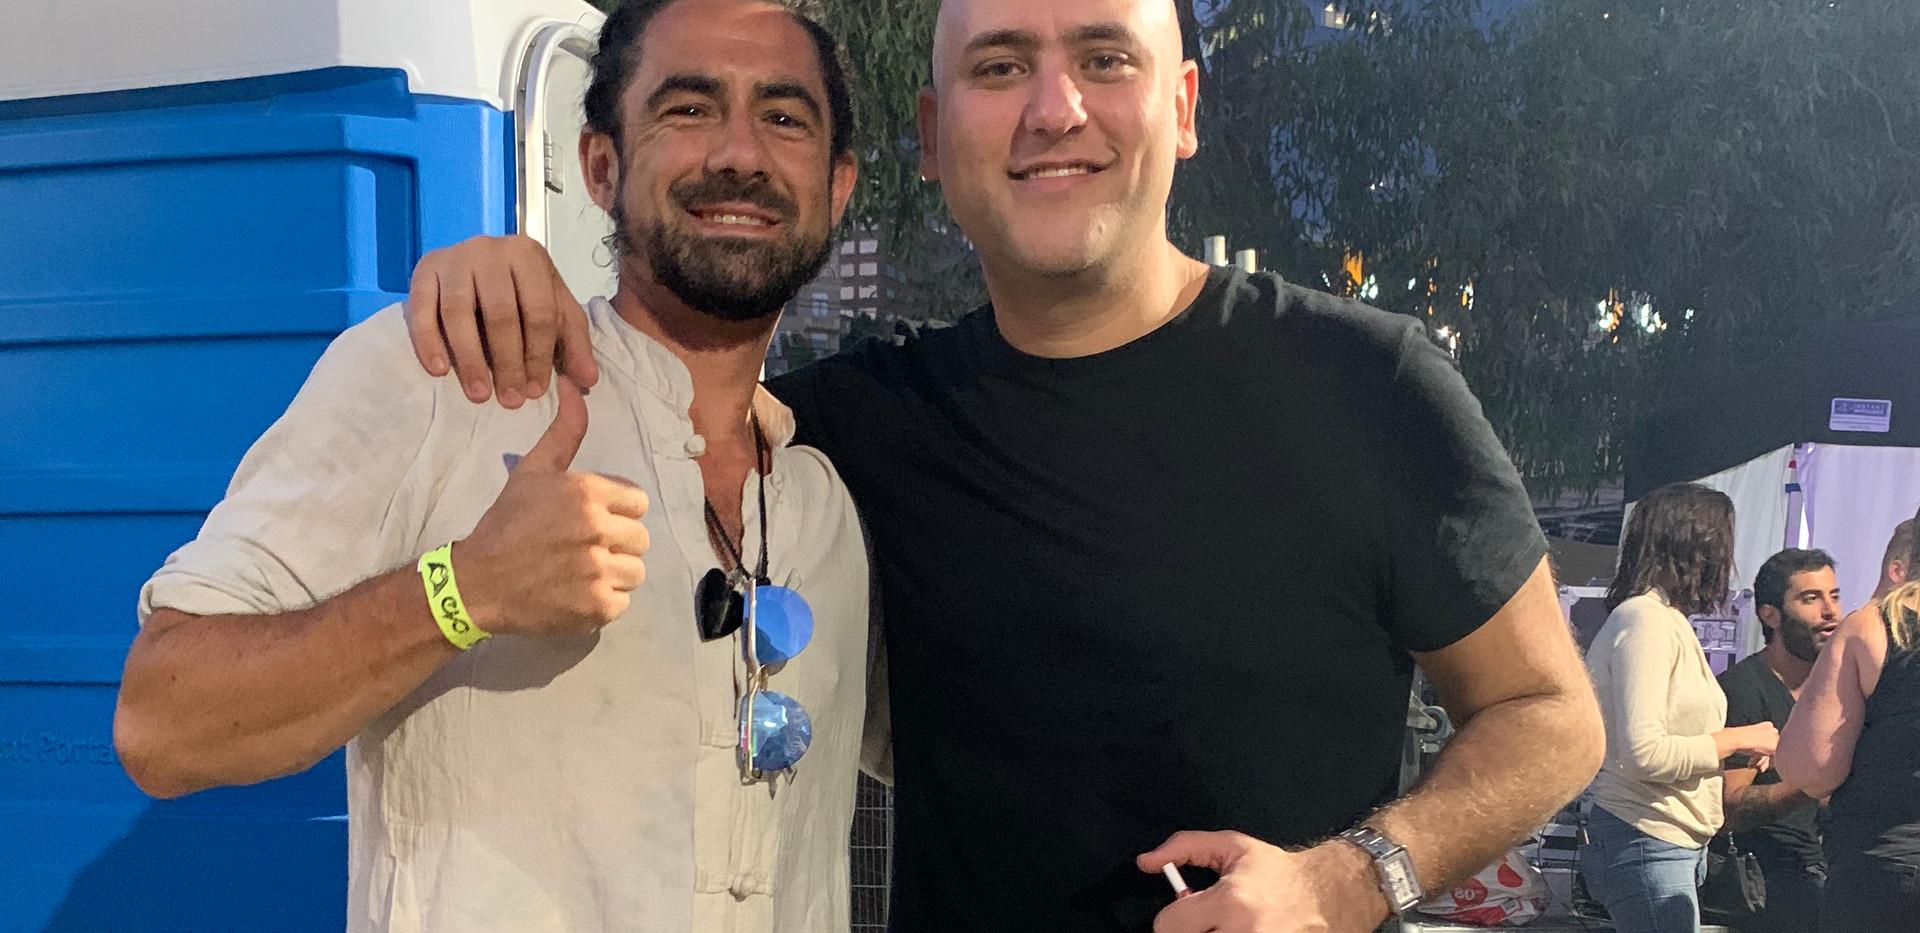 Trent with Fila at Sundown NYD_7718.JPG